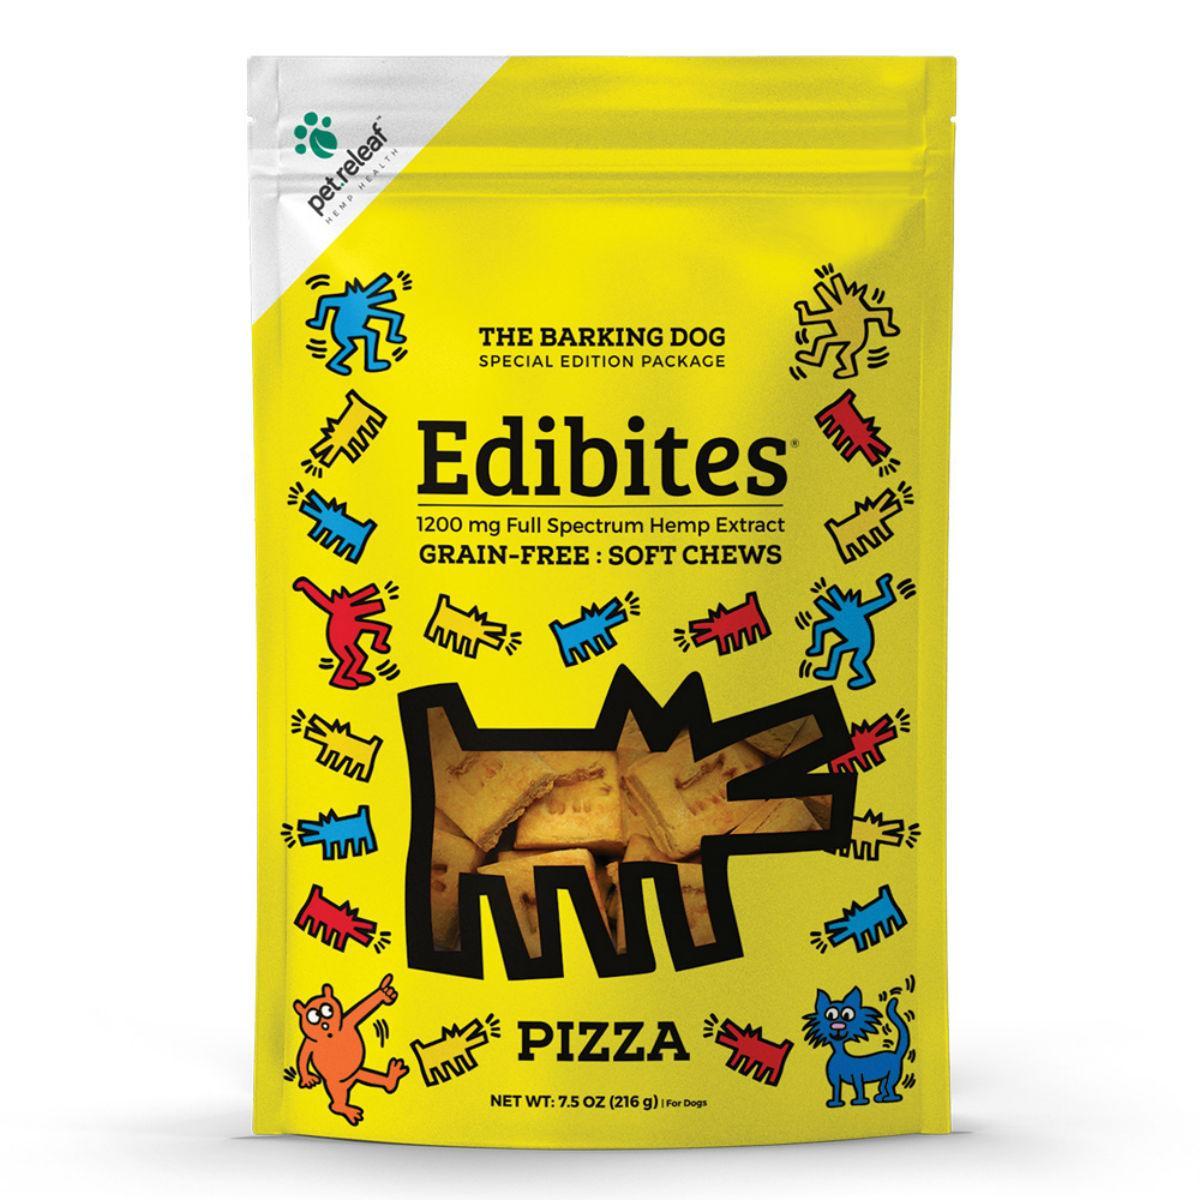 Pet Releaf Barking Dog Edibites Soft Chew Dog Treats - Pizza_main